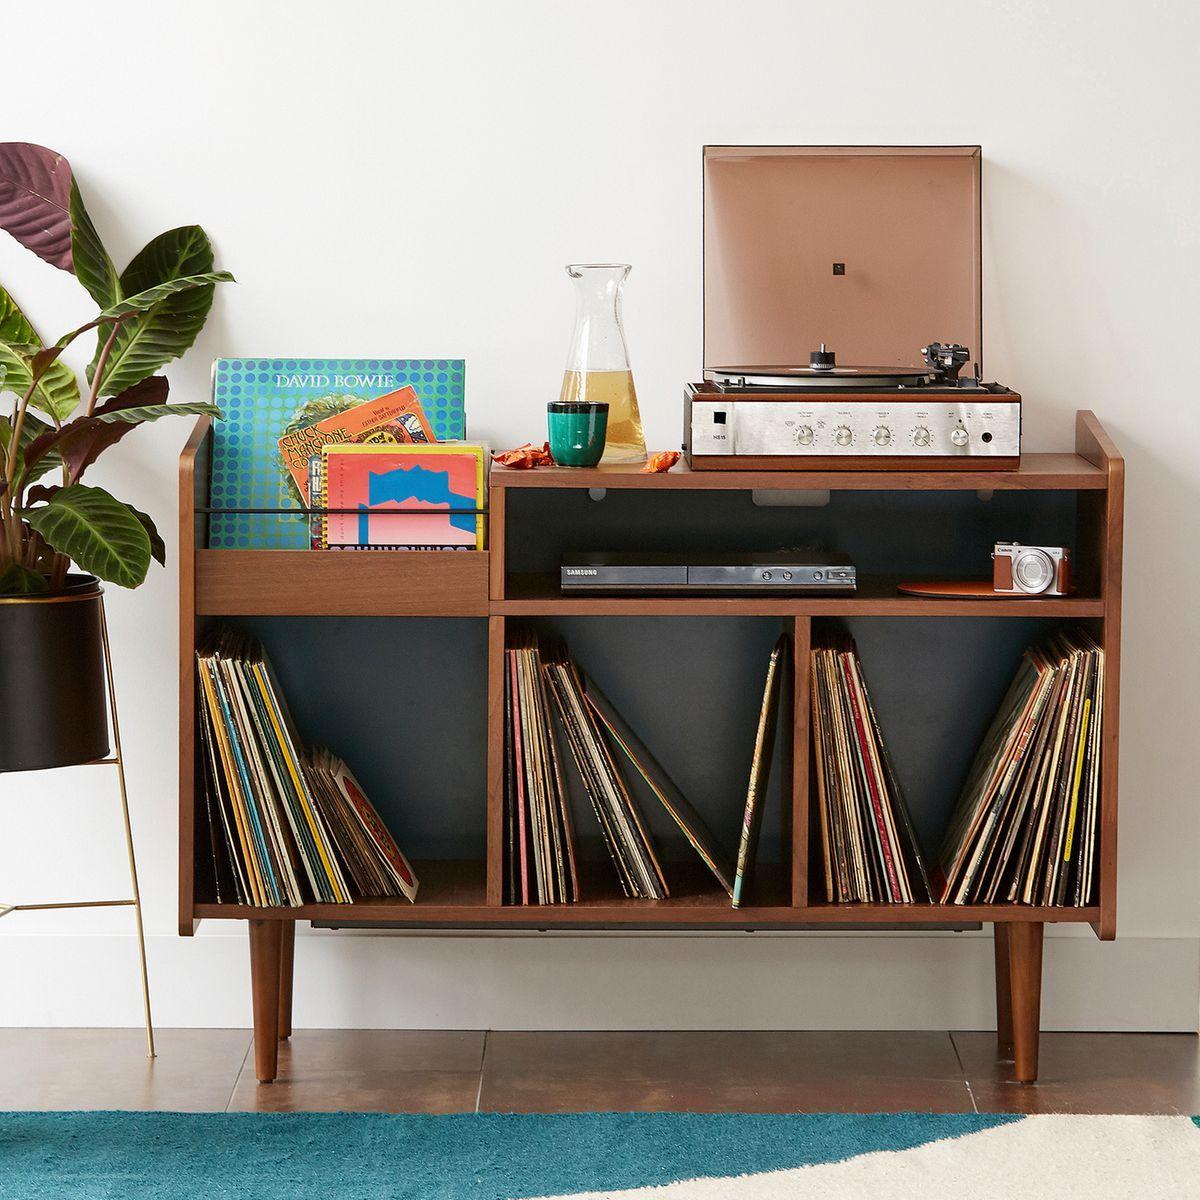 Meuble Vinyle Vintage Ronda Meuble Vinyle Meuble Hifi Rangement Vinyle